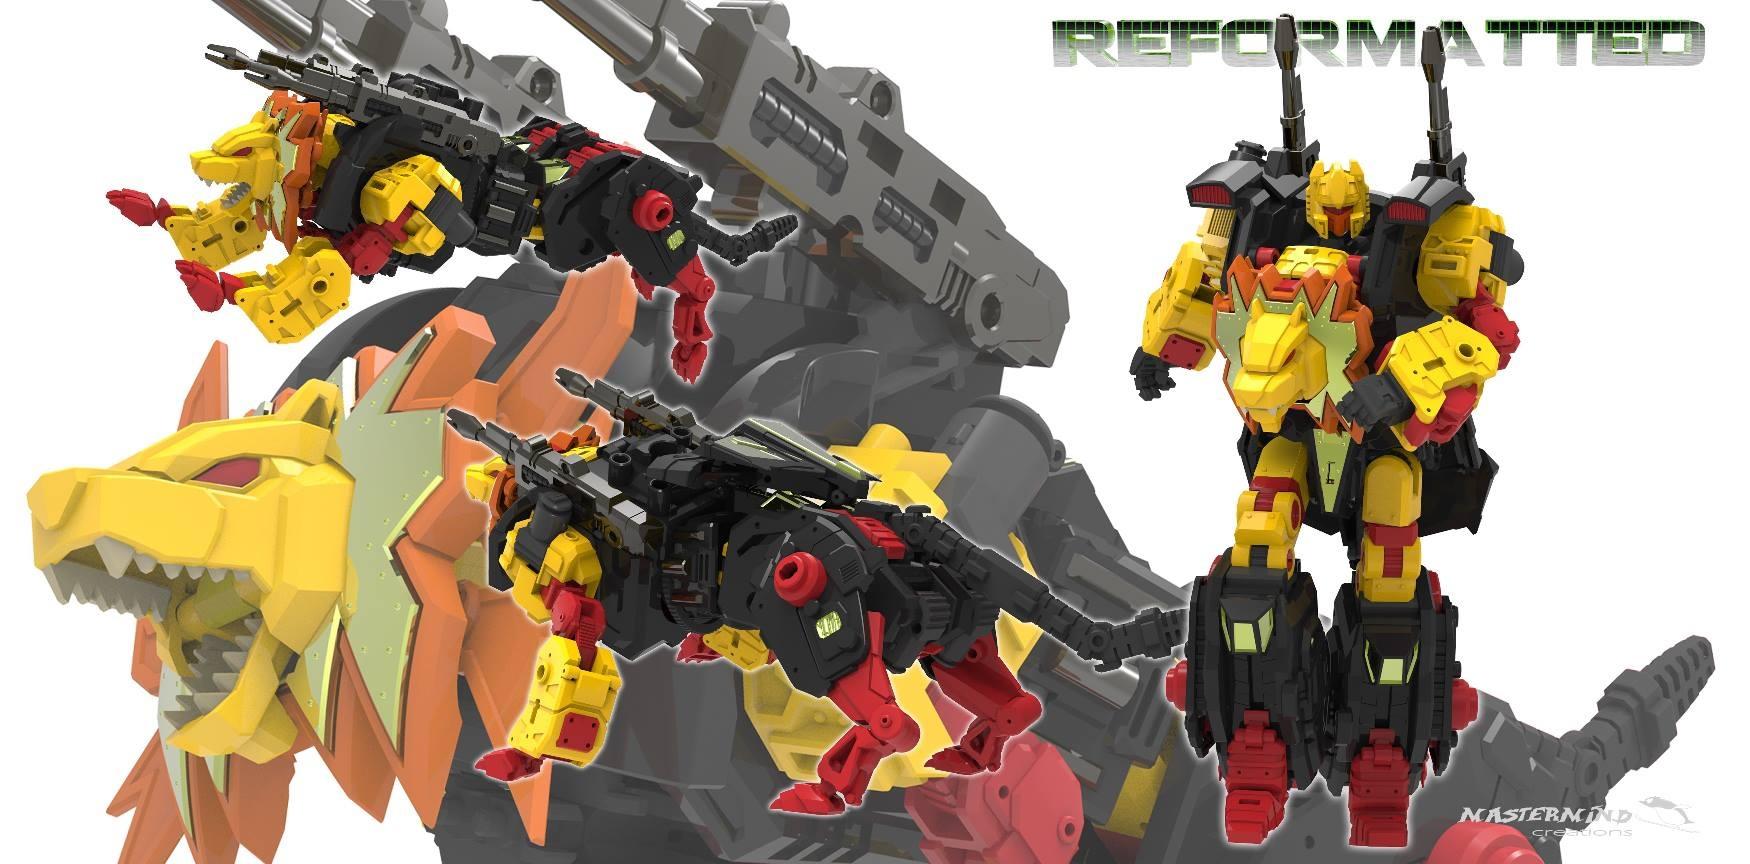 27367213d1369980952-mmc-feral-rex-mega-thread-image